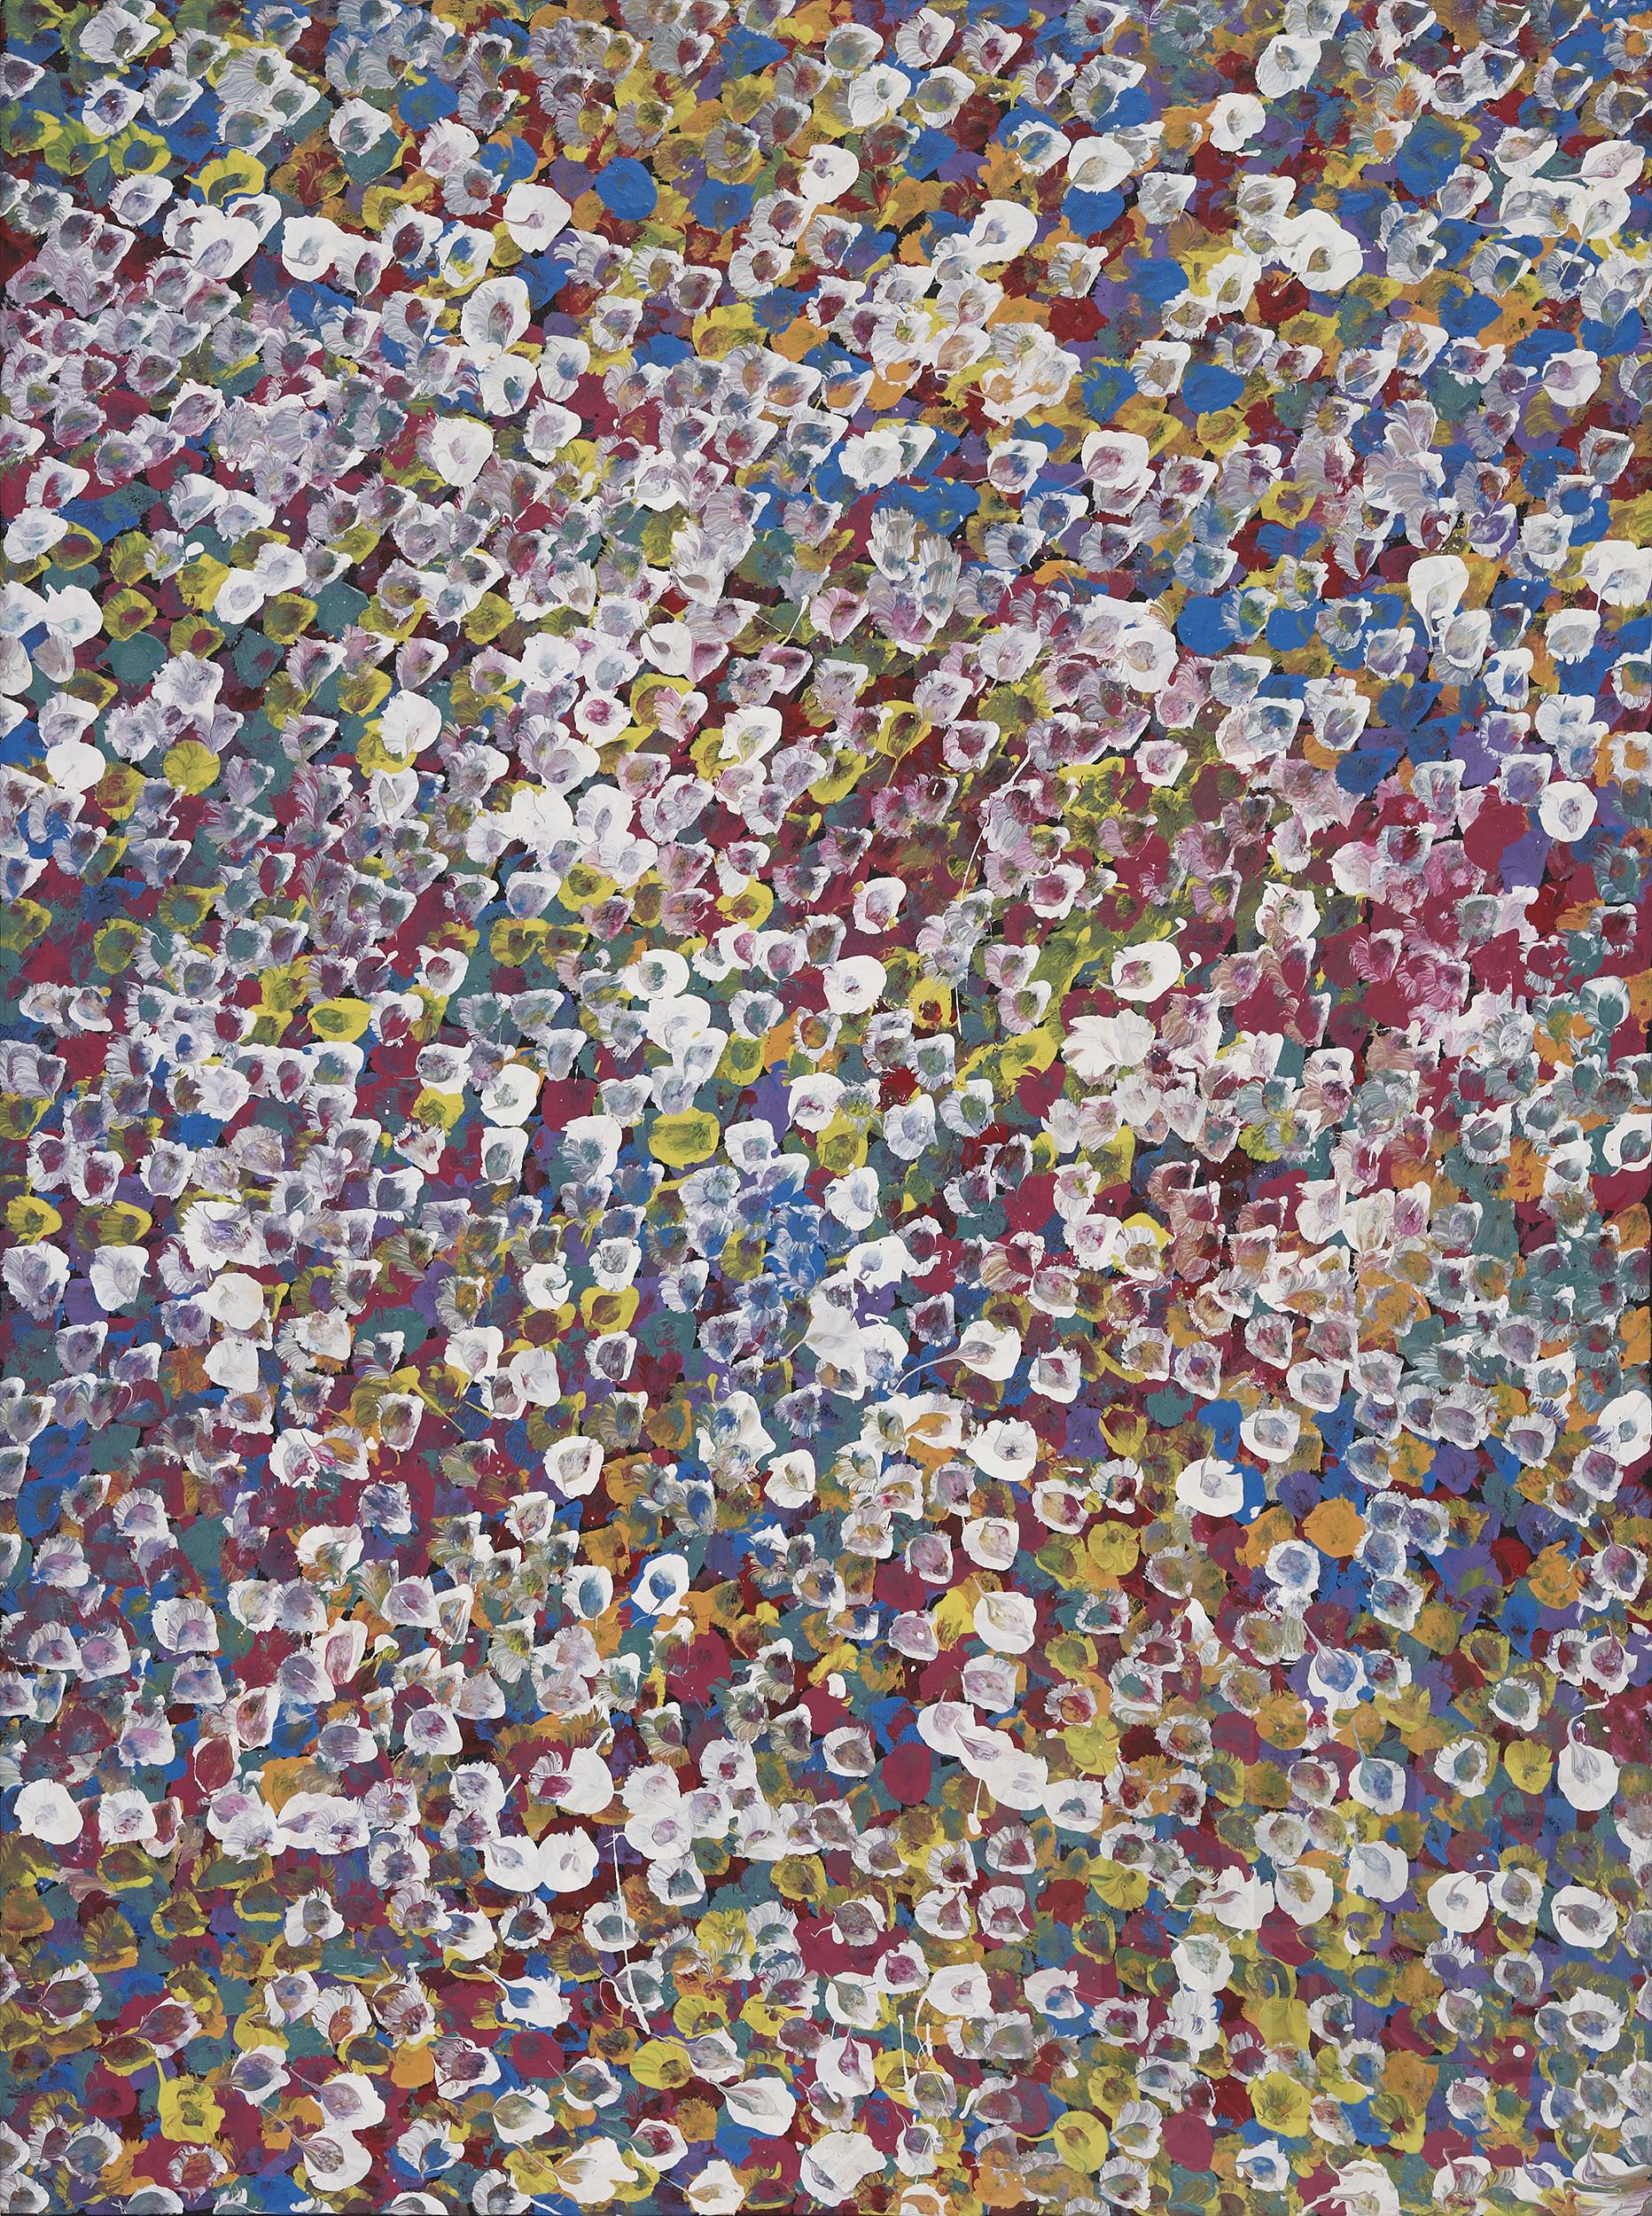 'Bessie Pitjara (born 1960), Bush Plum, Acrylic on Canvas, 94 x 70 cm'